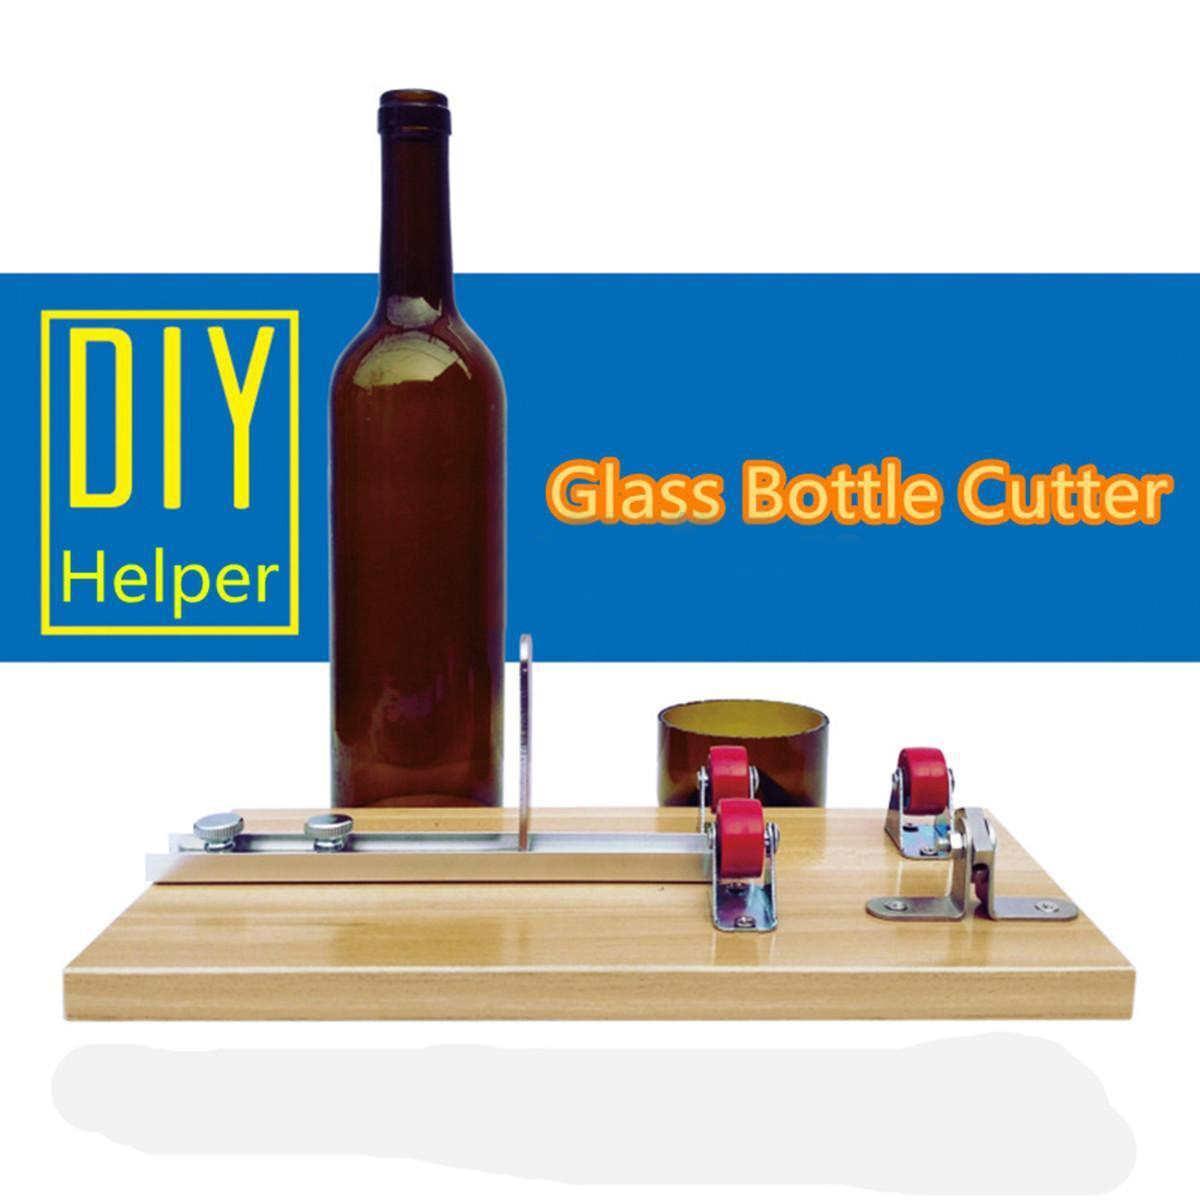 Top Quality DIY Glass Bottle Cutter Machine Beer Jar Cutter Easy To Use Glass Bottle Cutter Tool Mayitr Hand Tools 5pcs plastic bottle cutter machine craft tool diy kit blade accessories